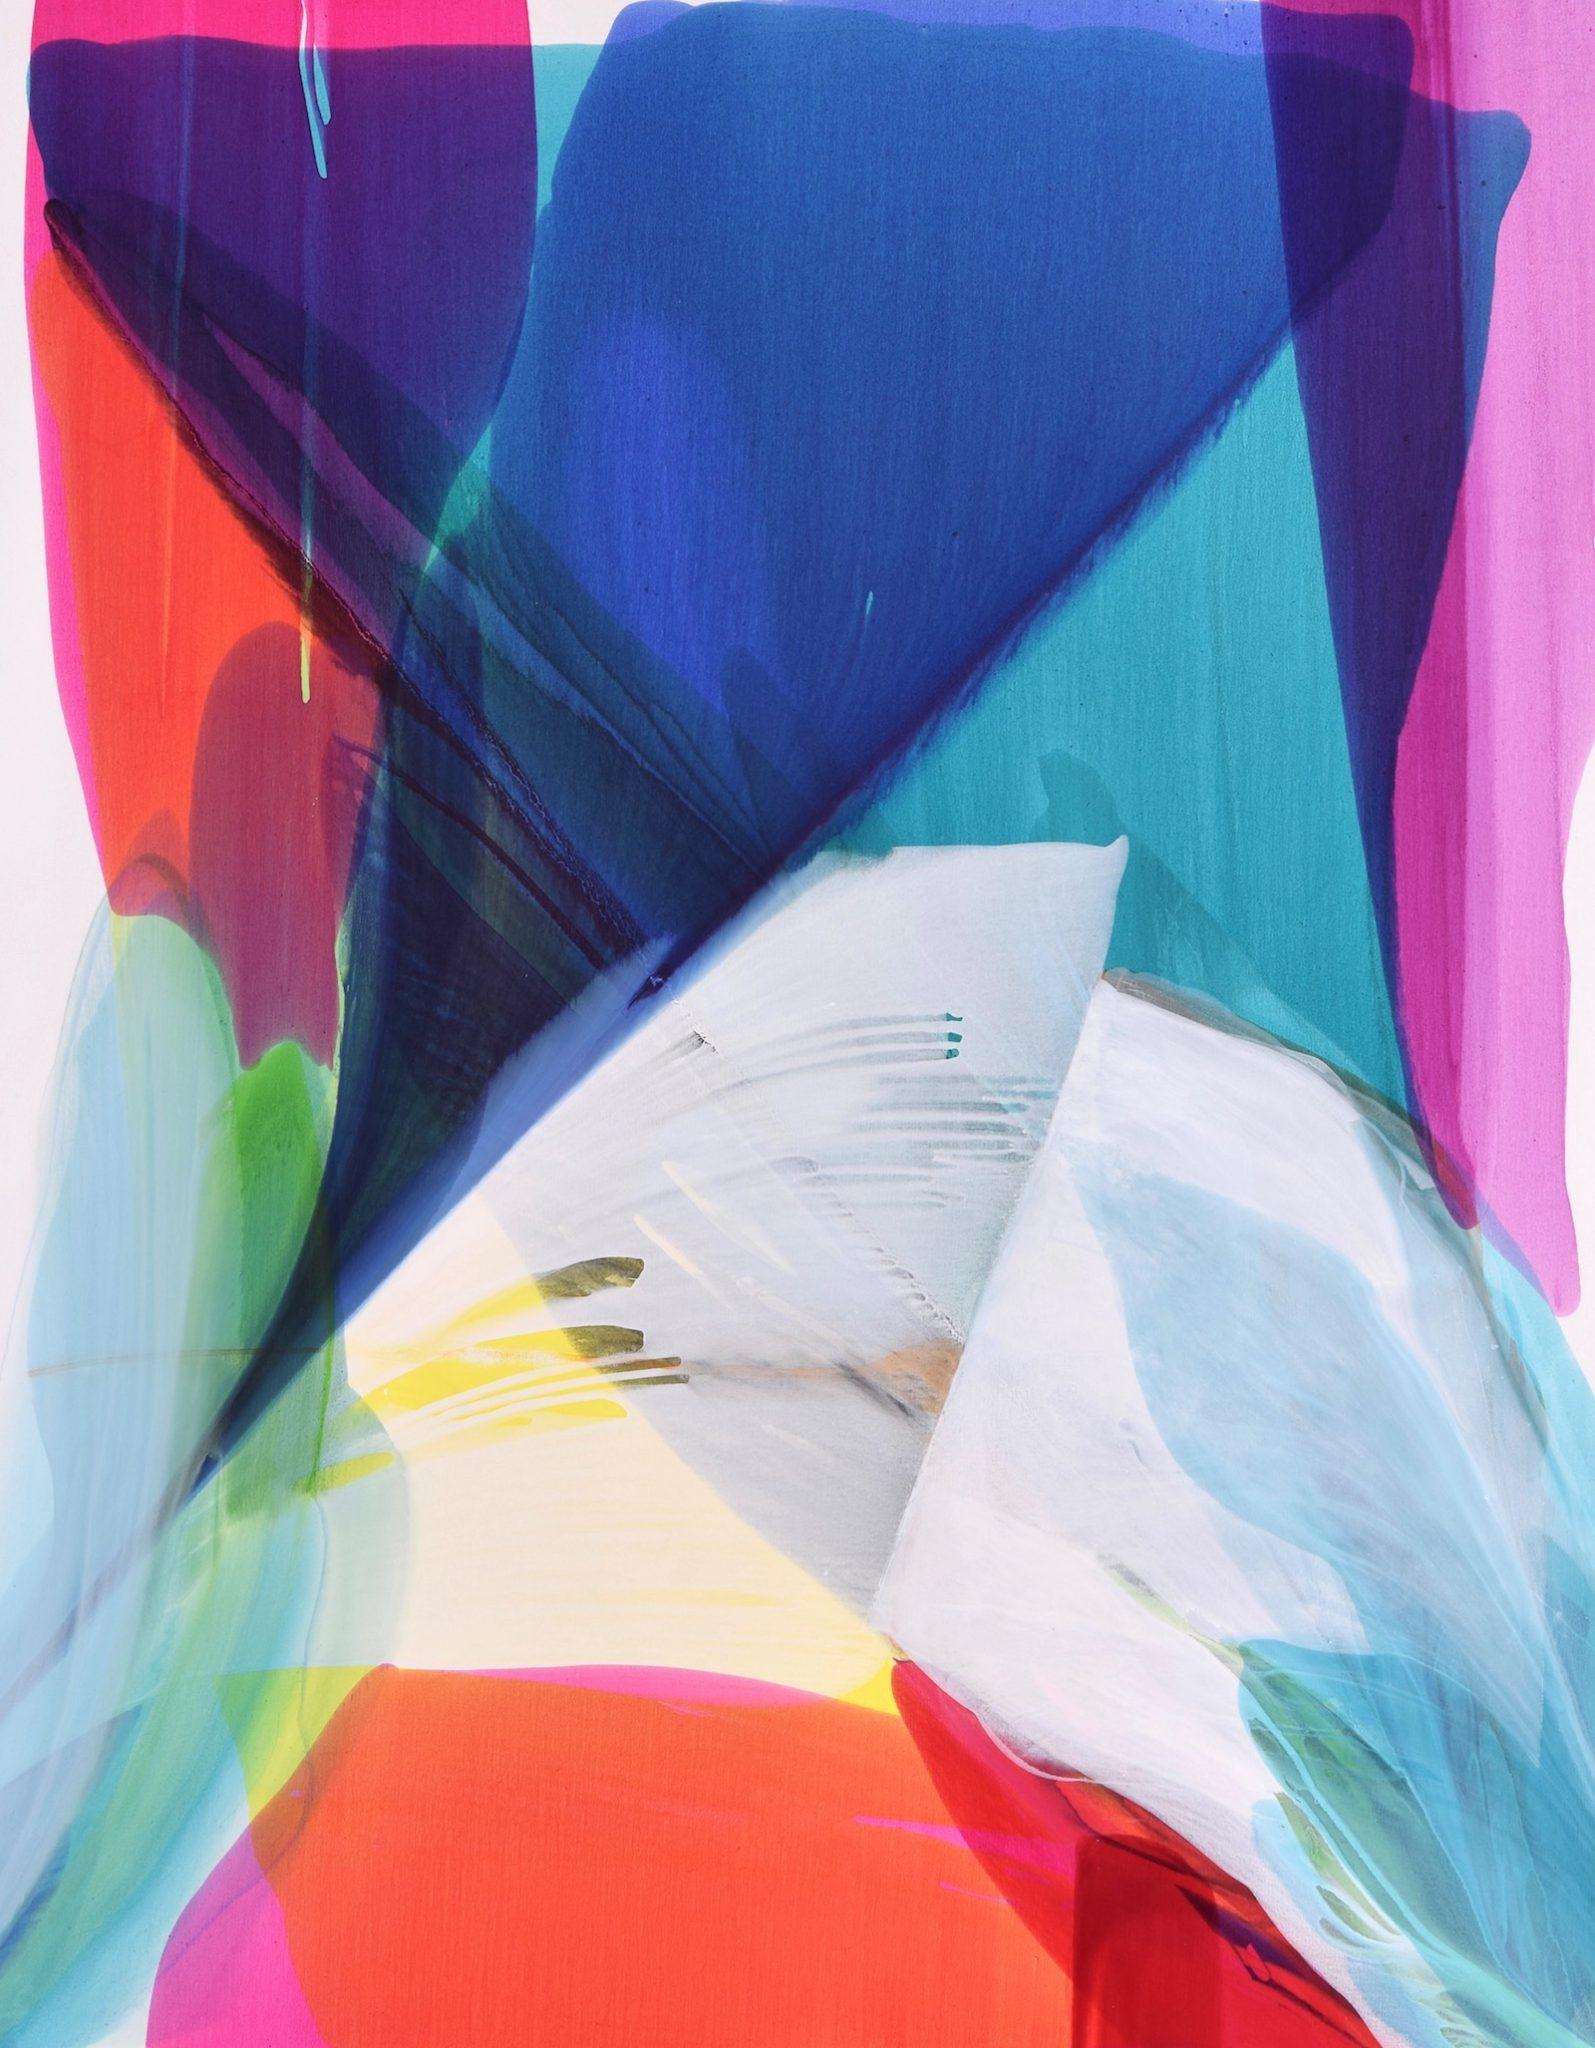 Cosmic Dream I 571/4×45 acrylic © Linda Stelling